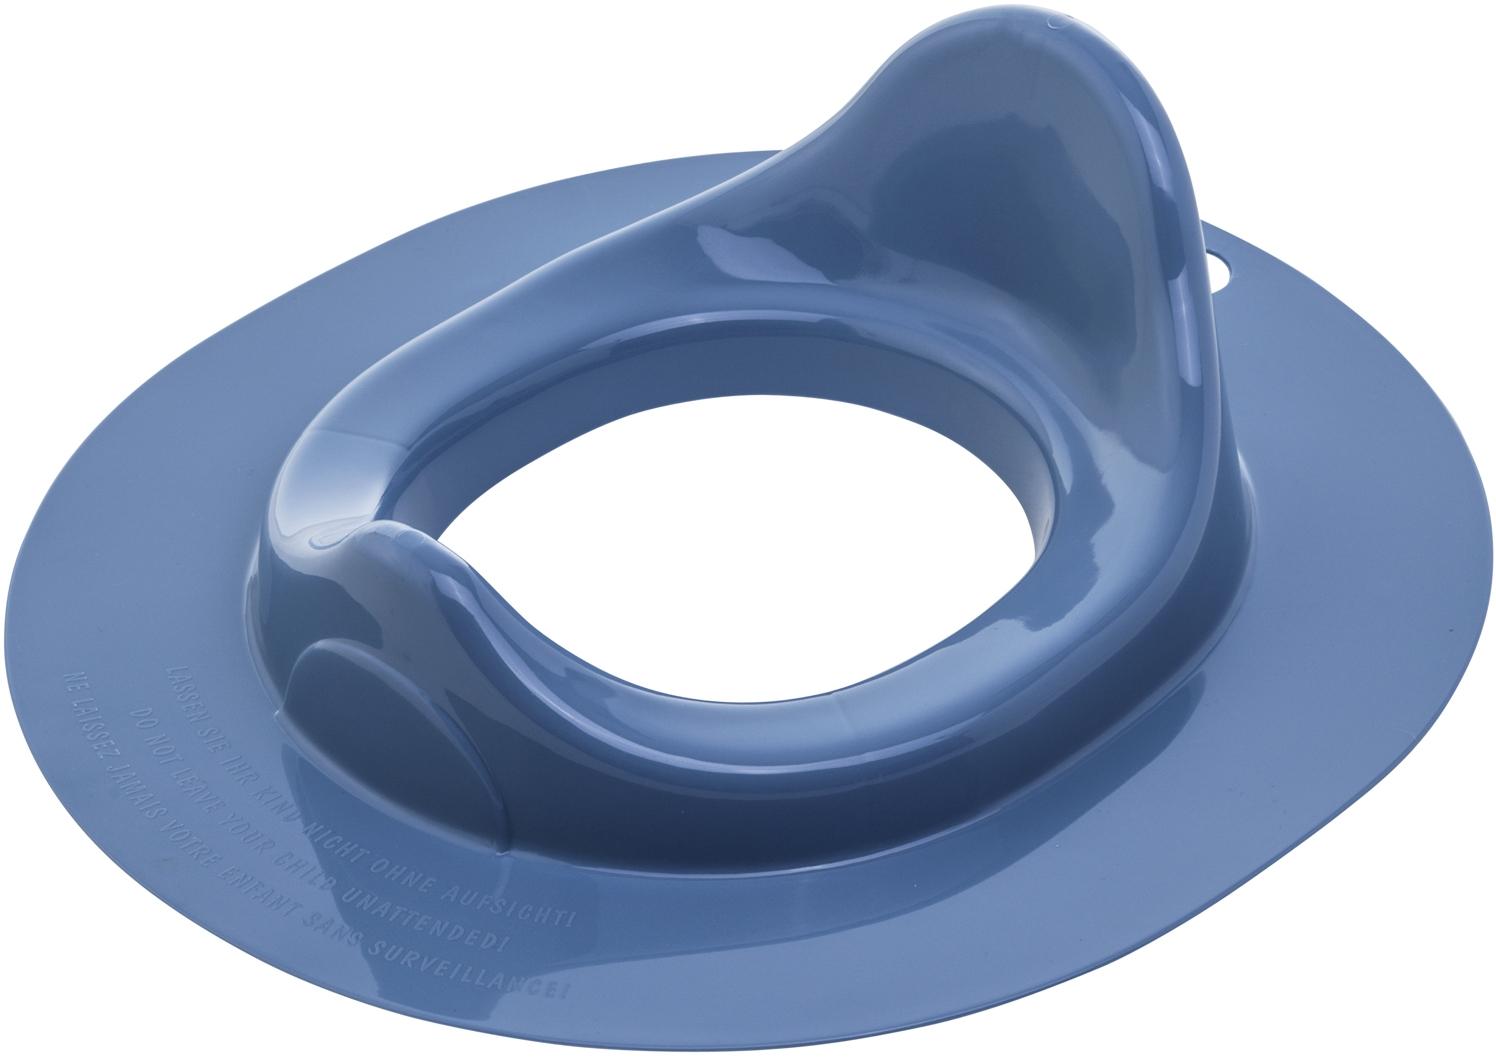 Bella Bambina WC Sitz Cool Blue